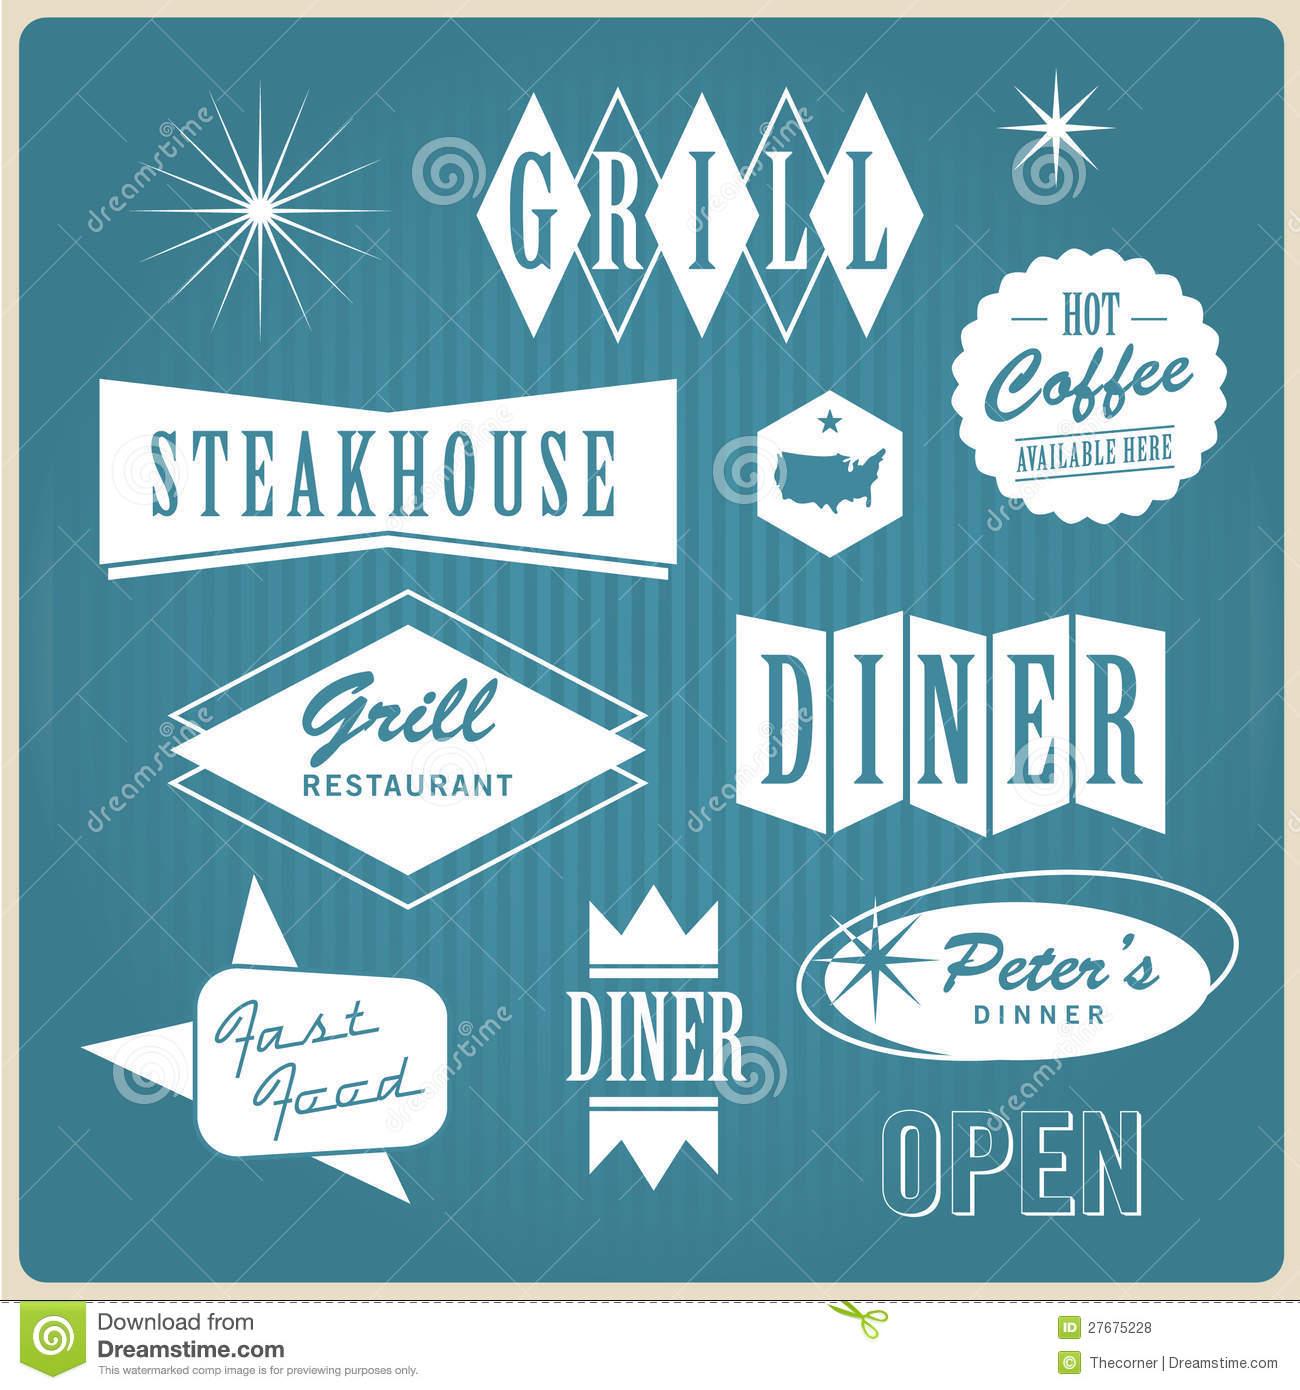 13 Retro Diner Vector Logo Templates Images